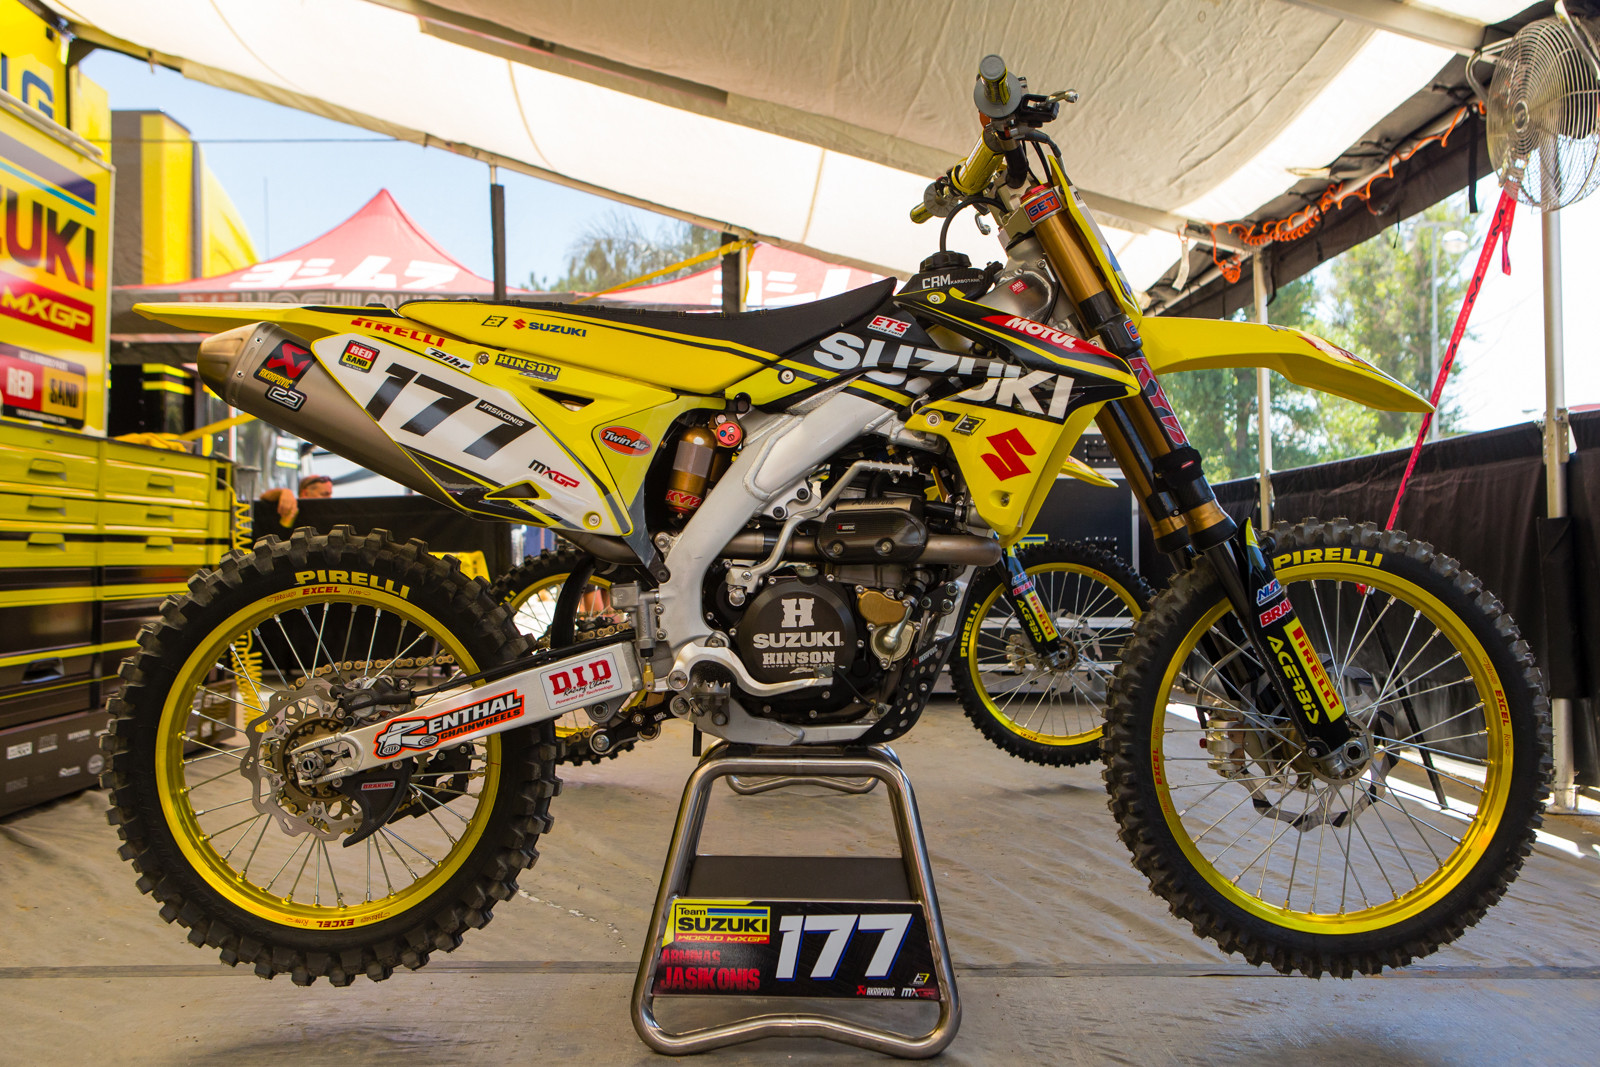 Arminas Jasikonis World Suzuki MXGP RM-Z450WS - Vital MX Pit Bits: 2016 MXGP of USA - Motocross Pictures - Vital MX